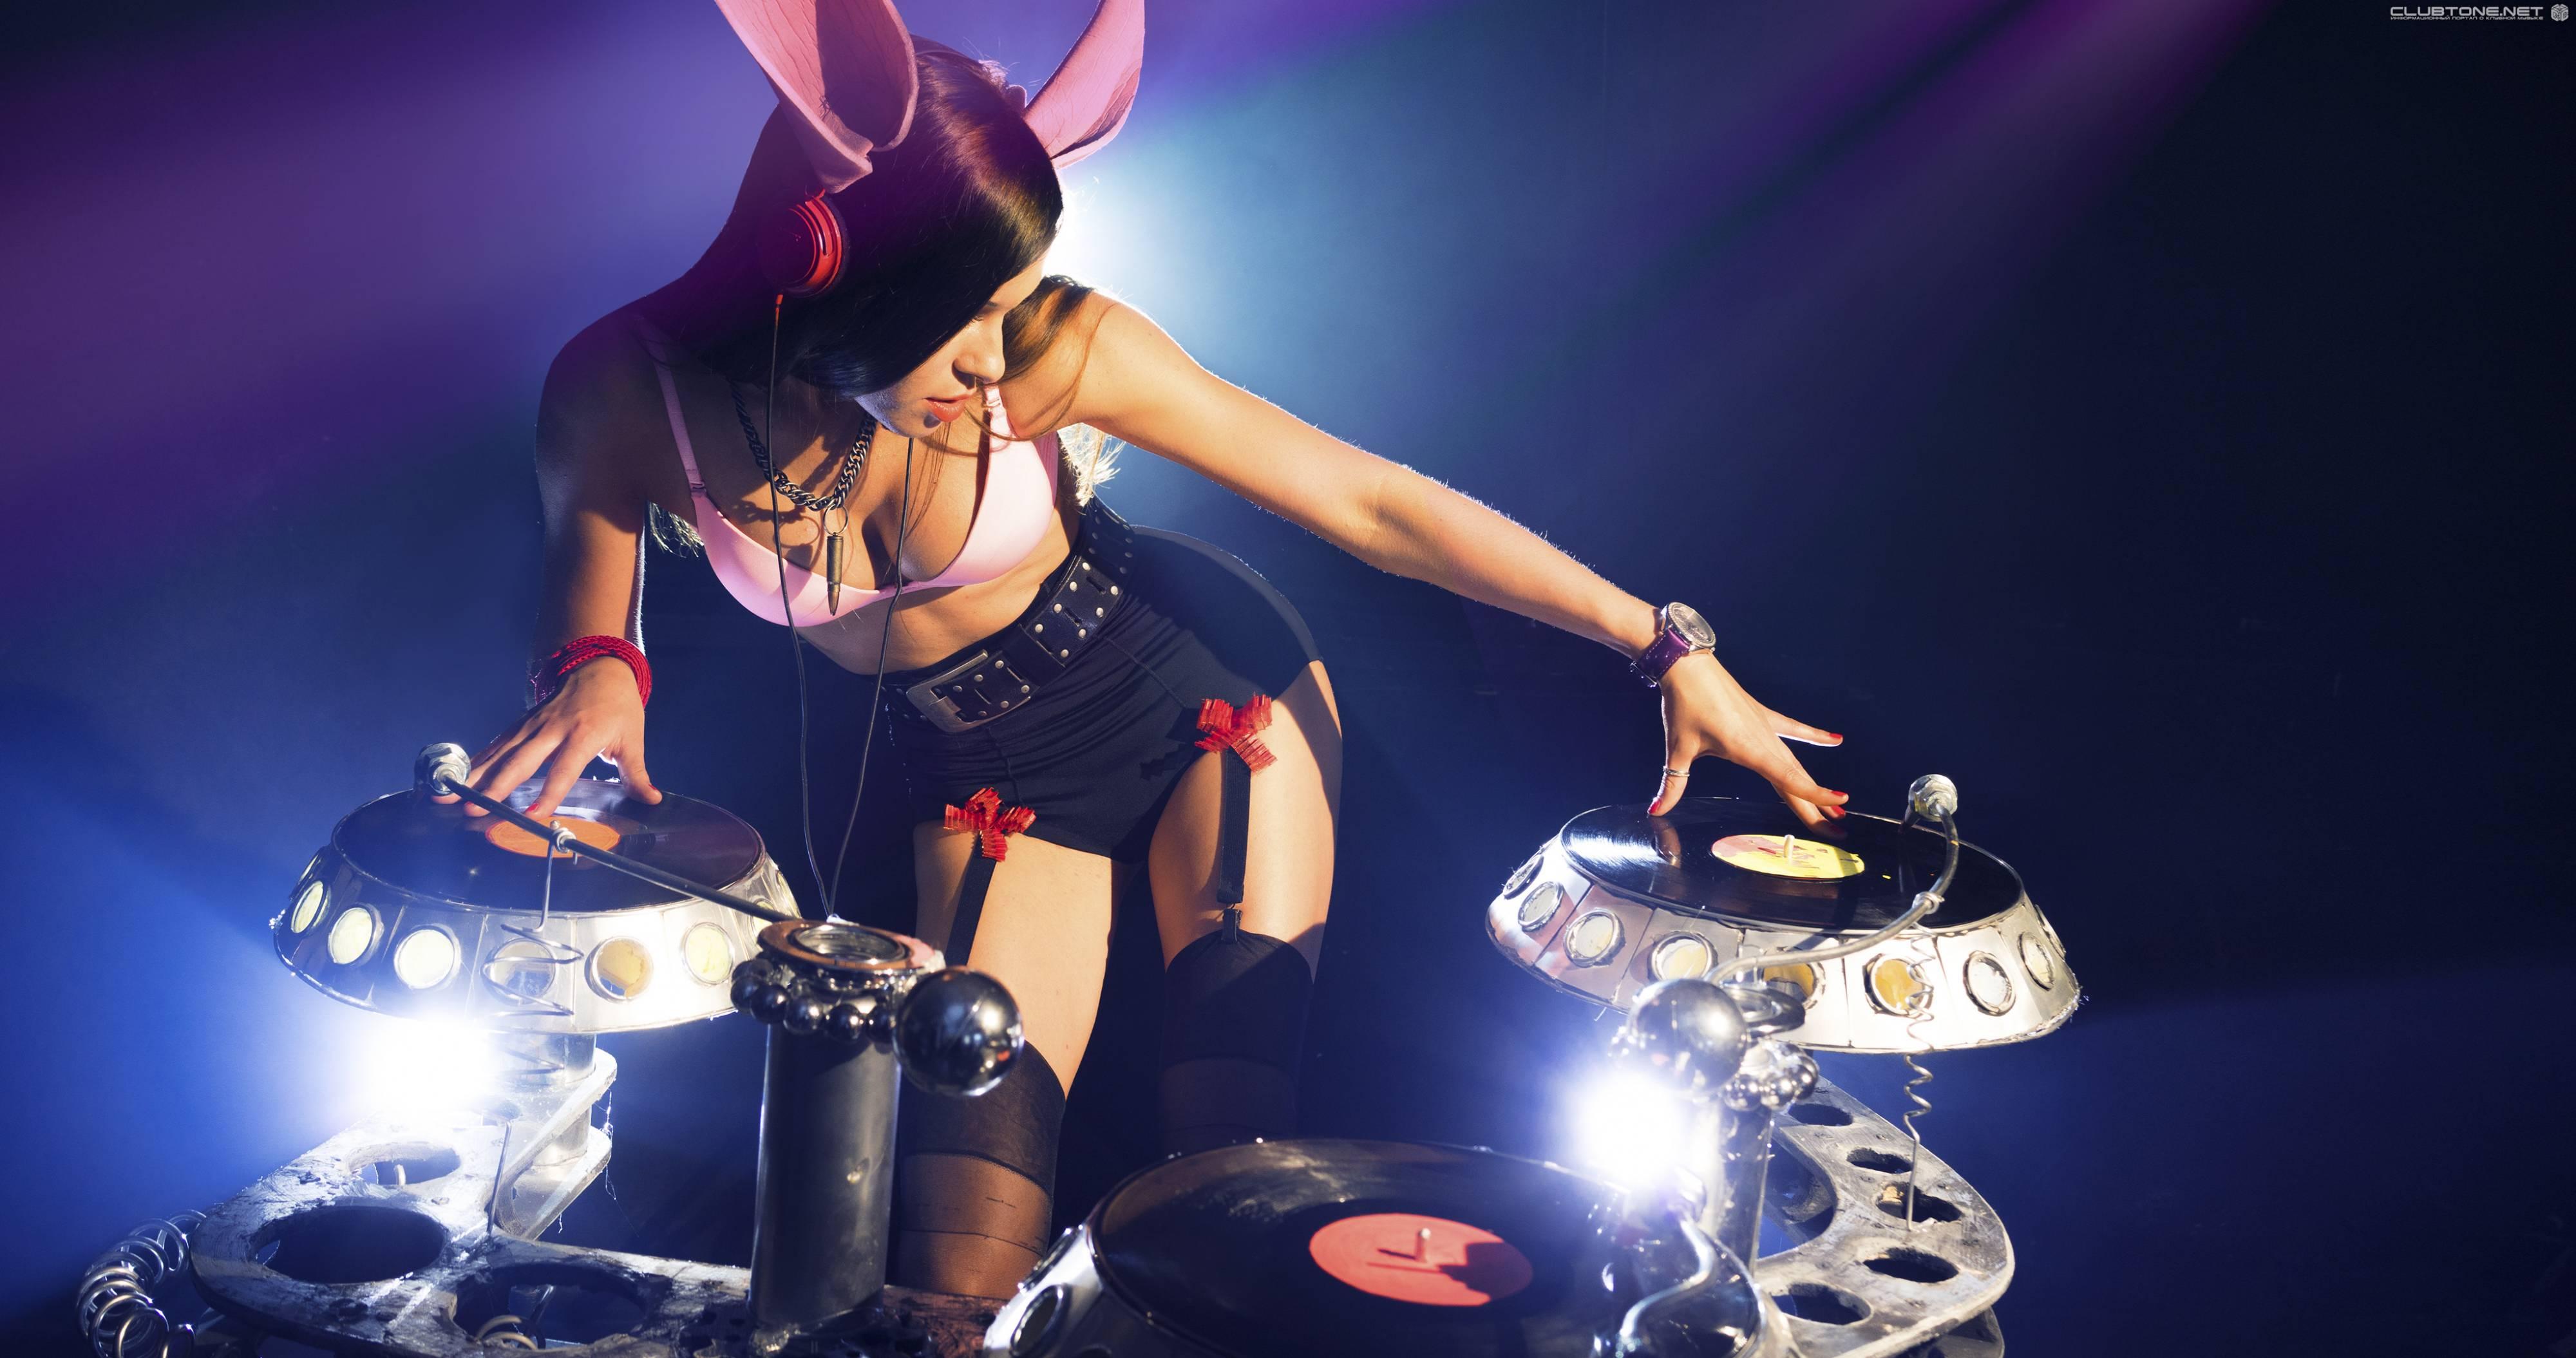 Sexy Girl In Webcam Doing Strip Dance  Redtube Free